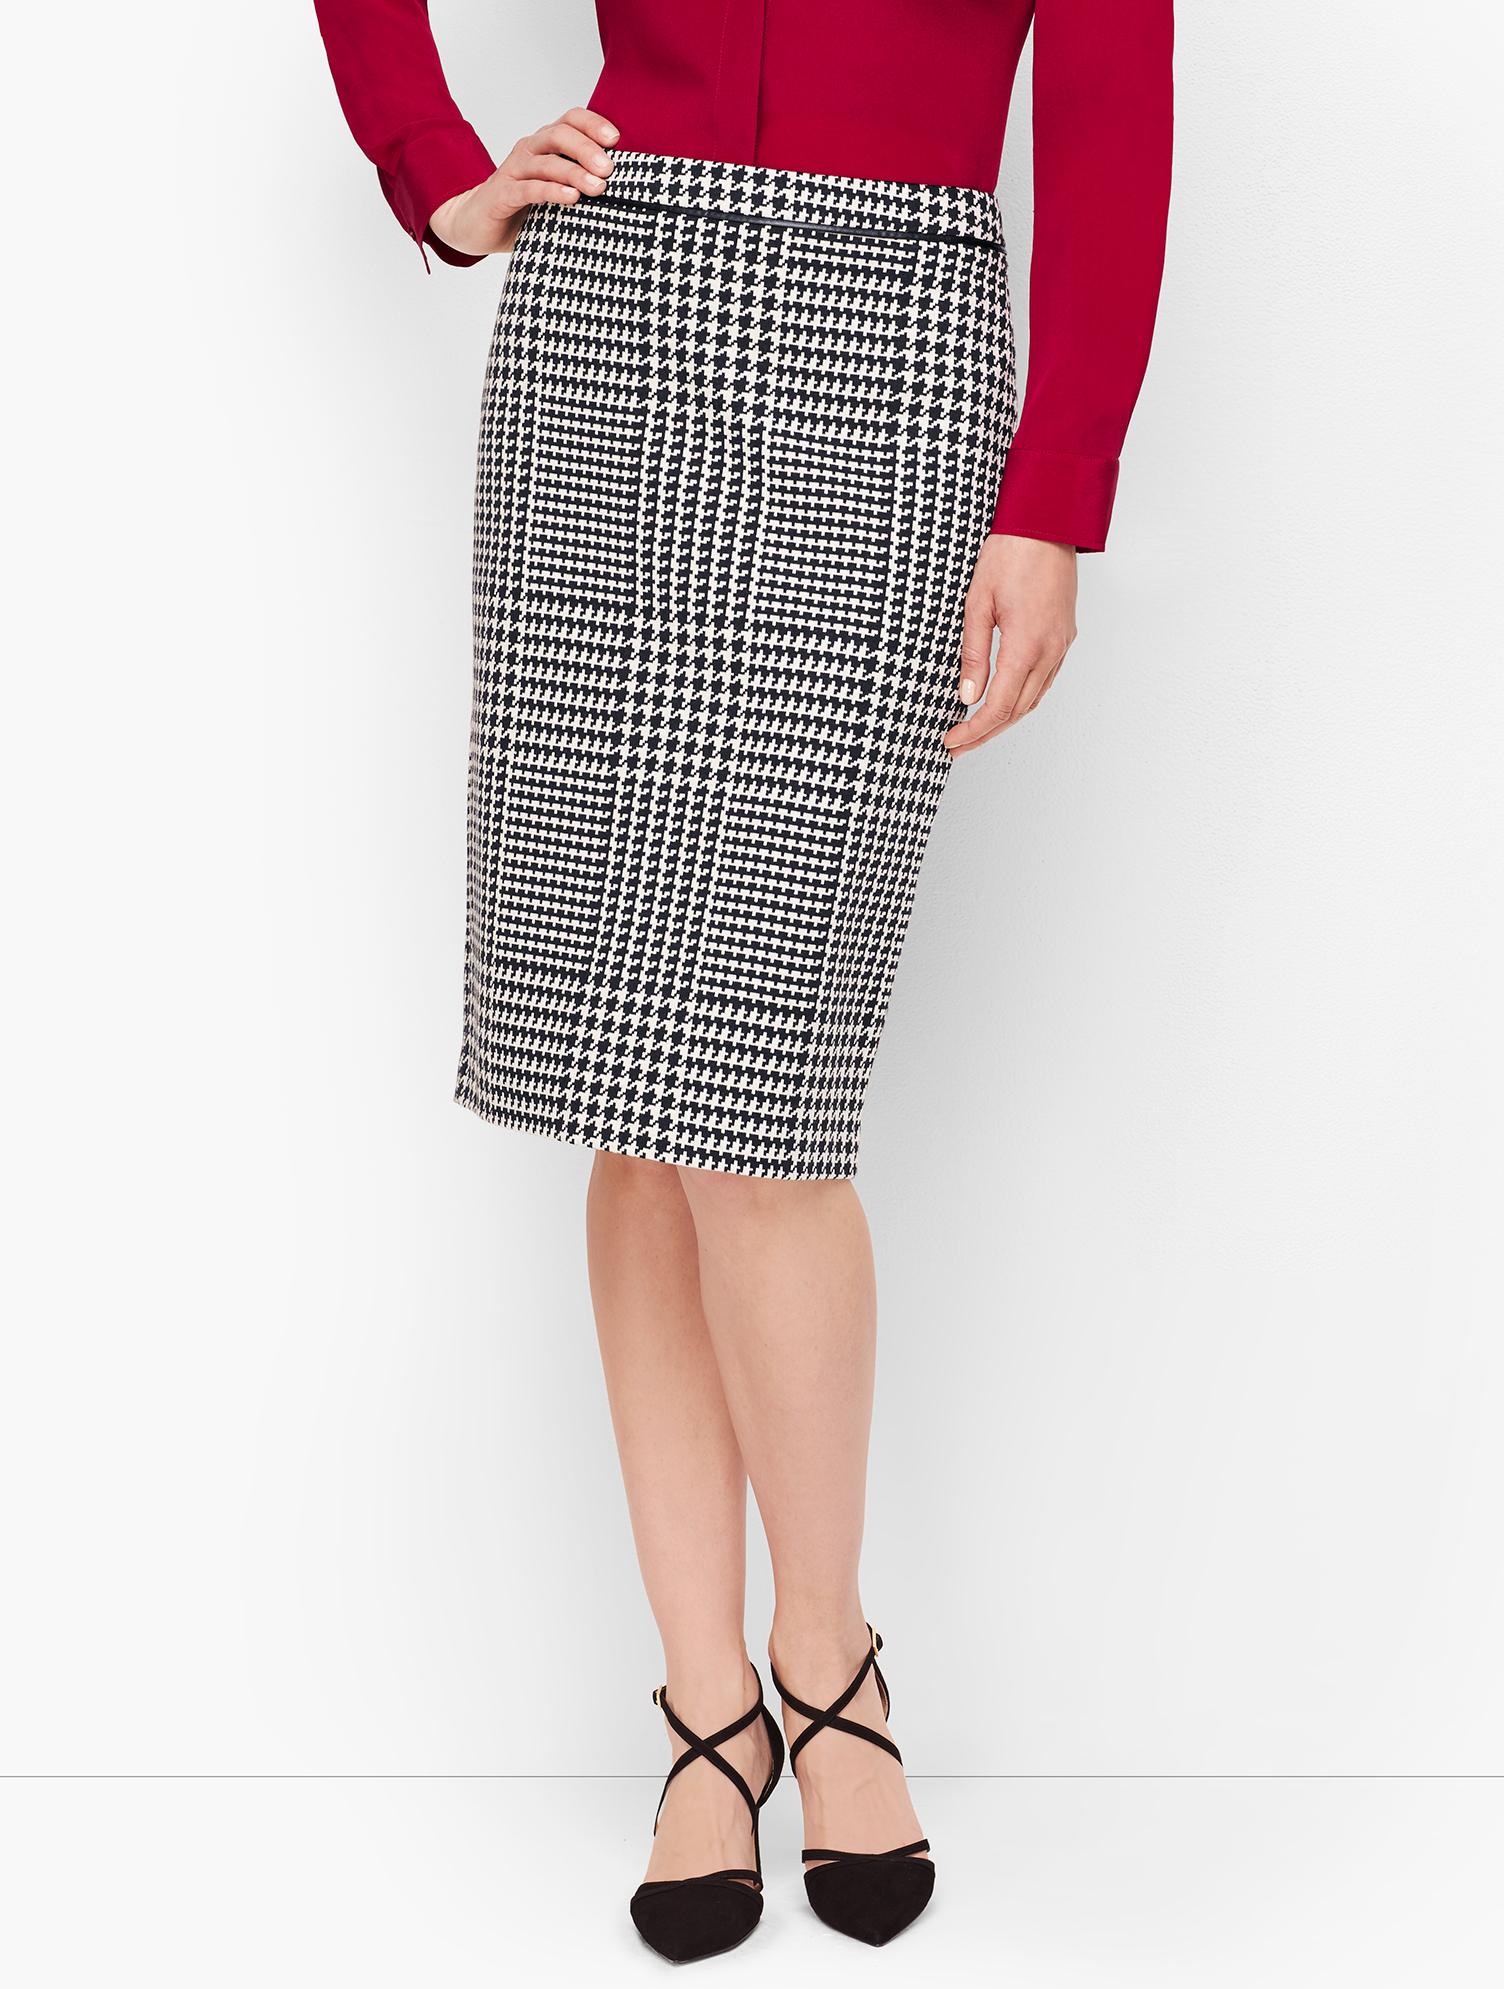 60s Skirts | 70s Hippie Skirts, Jumper Dresses Jacquard Pencil Skirt - BLACKWHITE - 16 - Talbots $55.69 AT vintagedancer.com